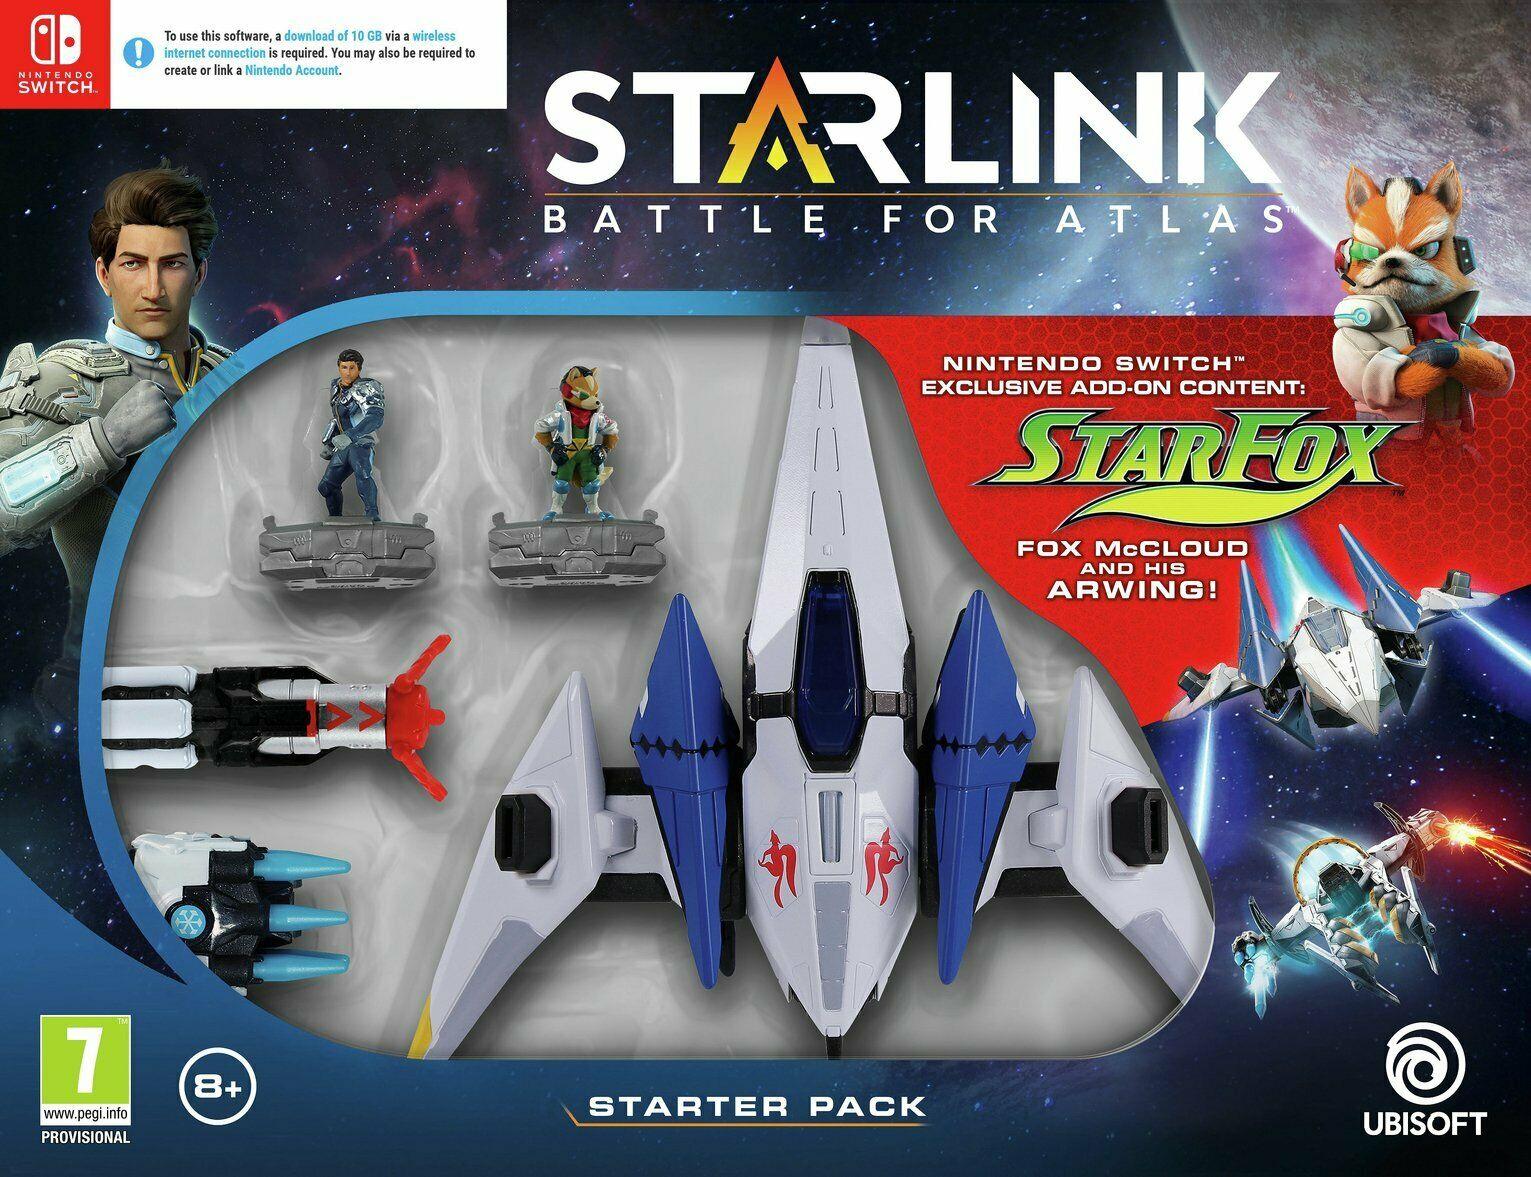 Starlink: Battle For Atlas Starter Pack (Nintendo Switch) - £11.99 delivered @ Argos eBay